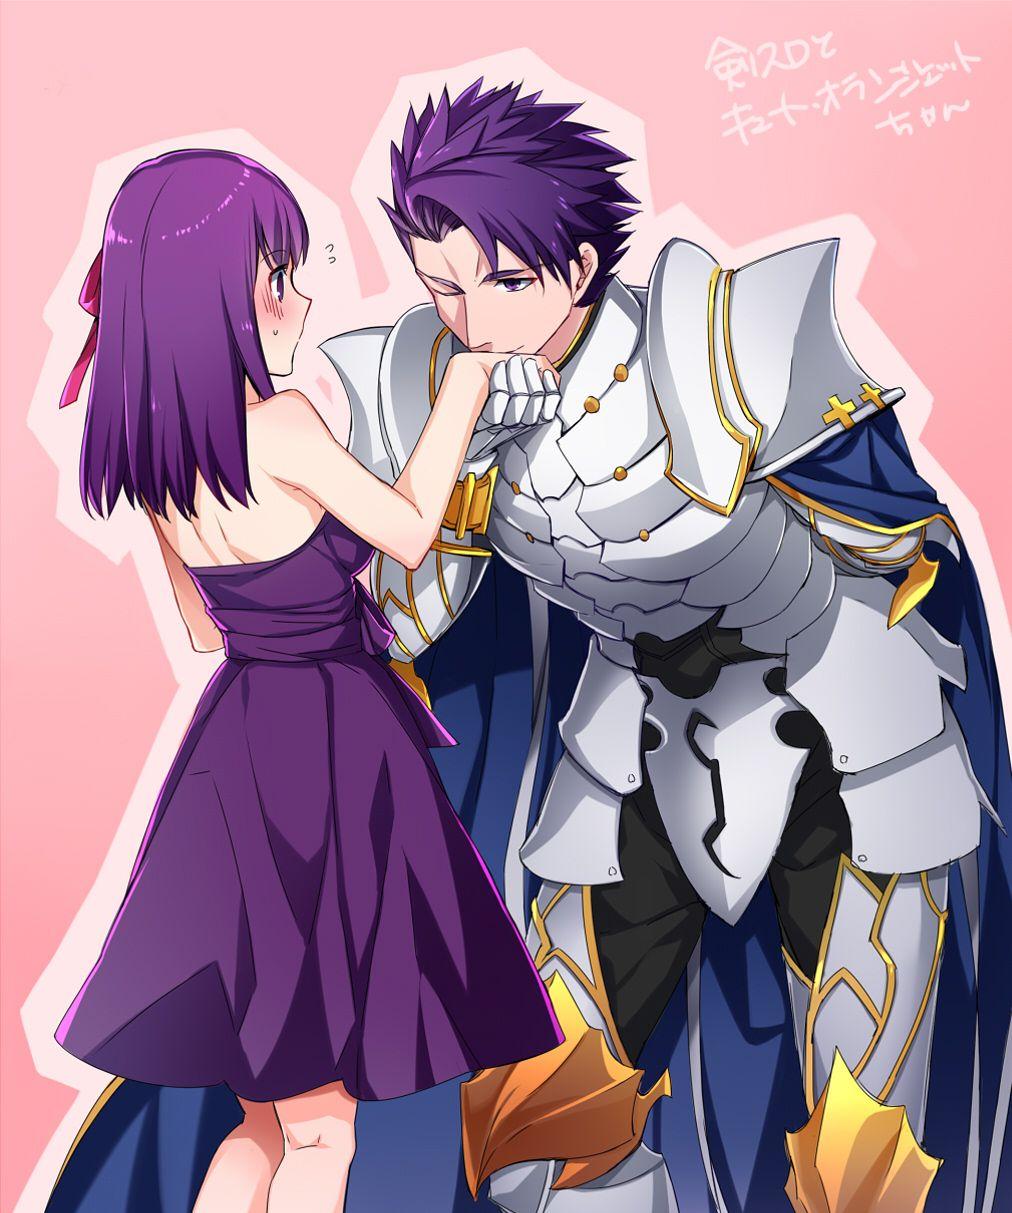 Sakura Matou Lancelot Fate Grand Order Fate Stay Night Anime Fate Anime Series Fate Stay Night